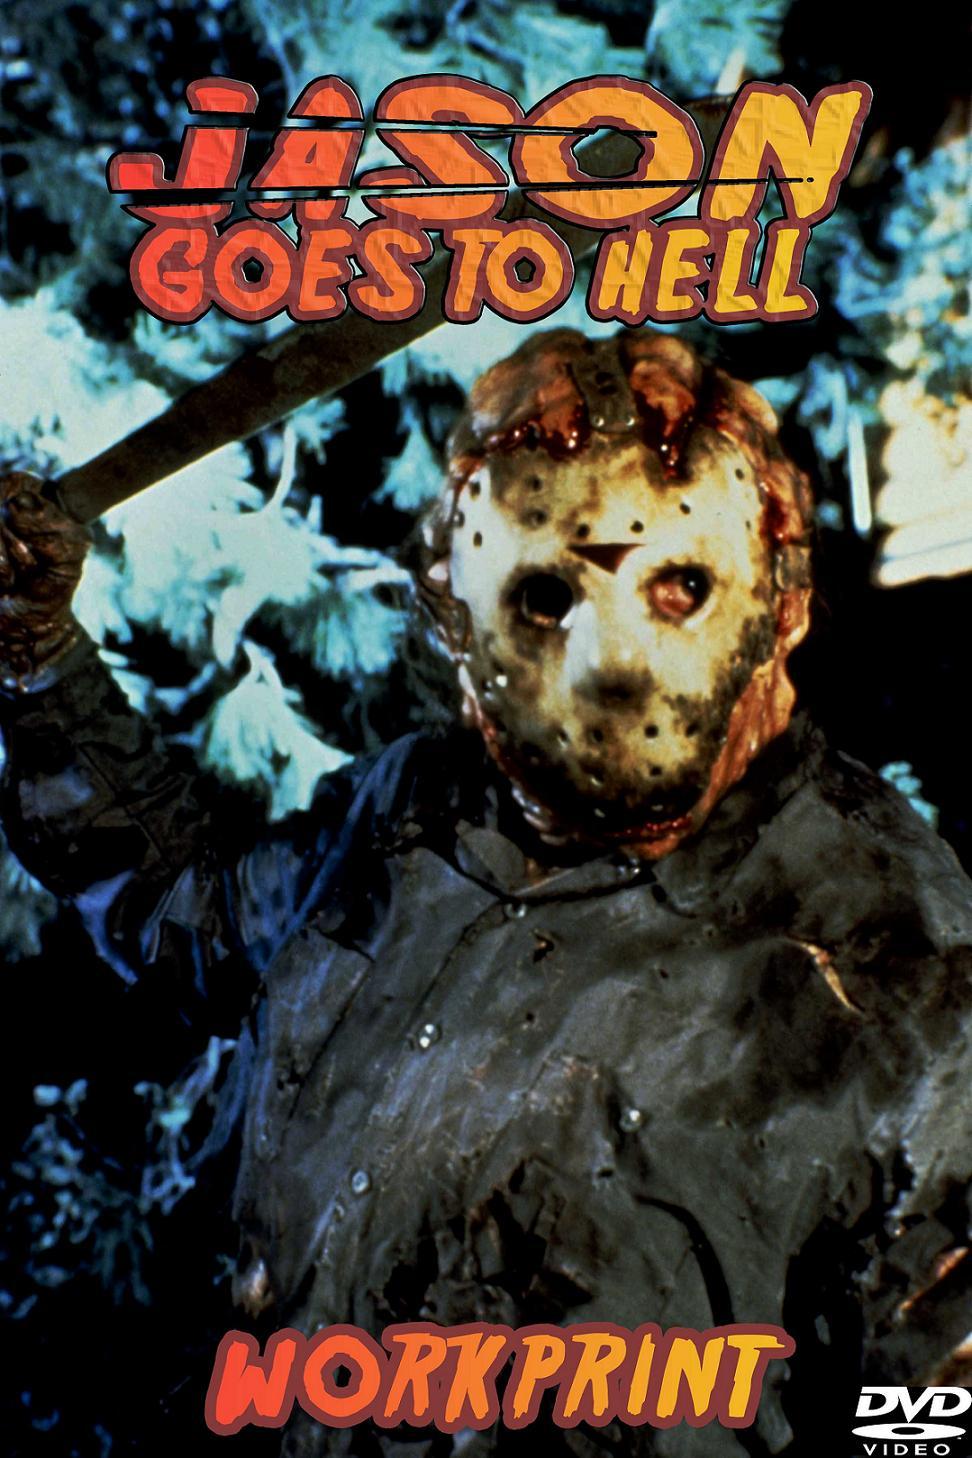 Phantom Nightmare Jason Goes To Hell Workprint